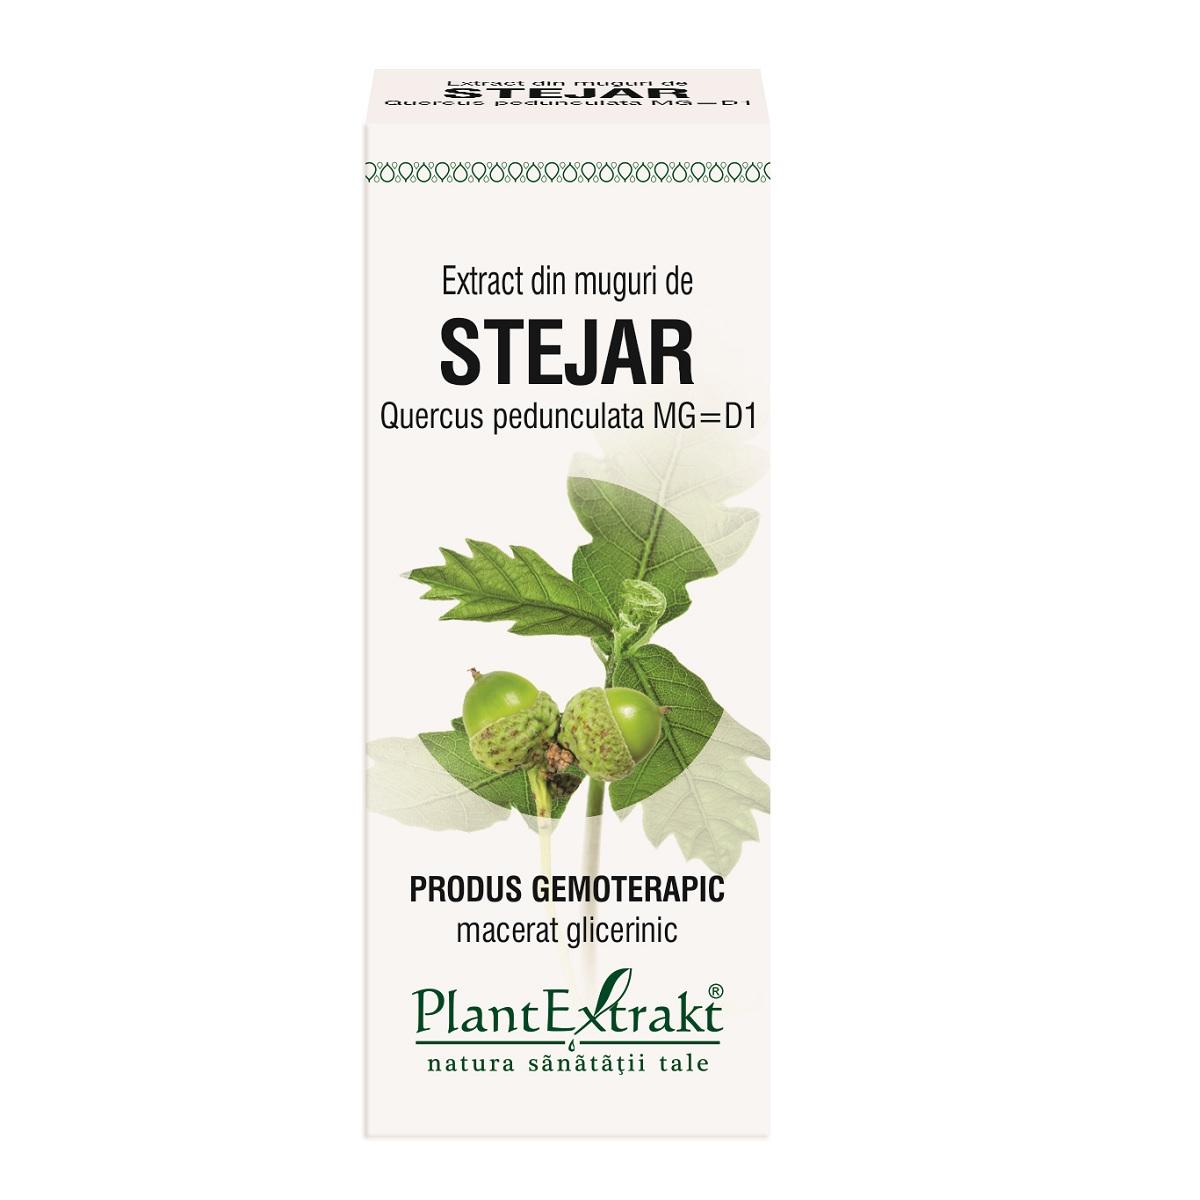 Extract din muguri de Stejar, 50ml, PlantExtrakt imagine produs 2021